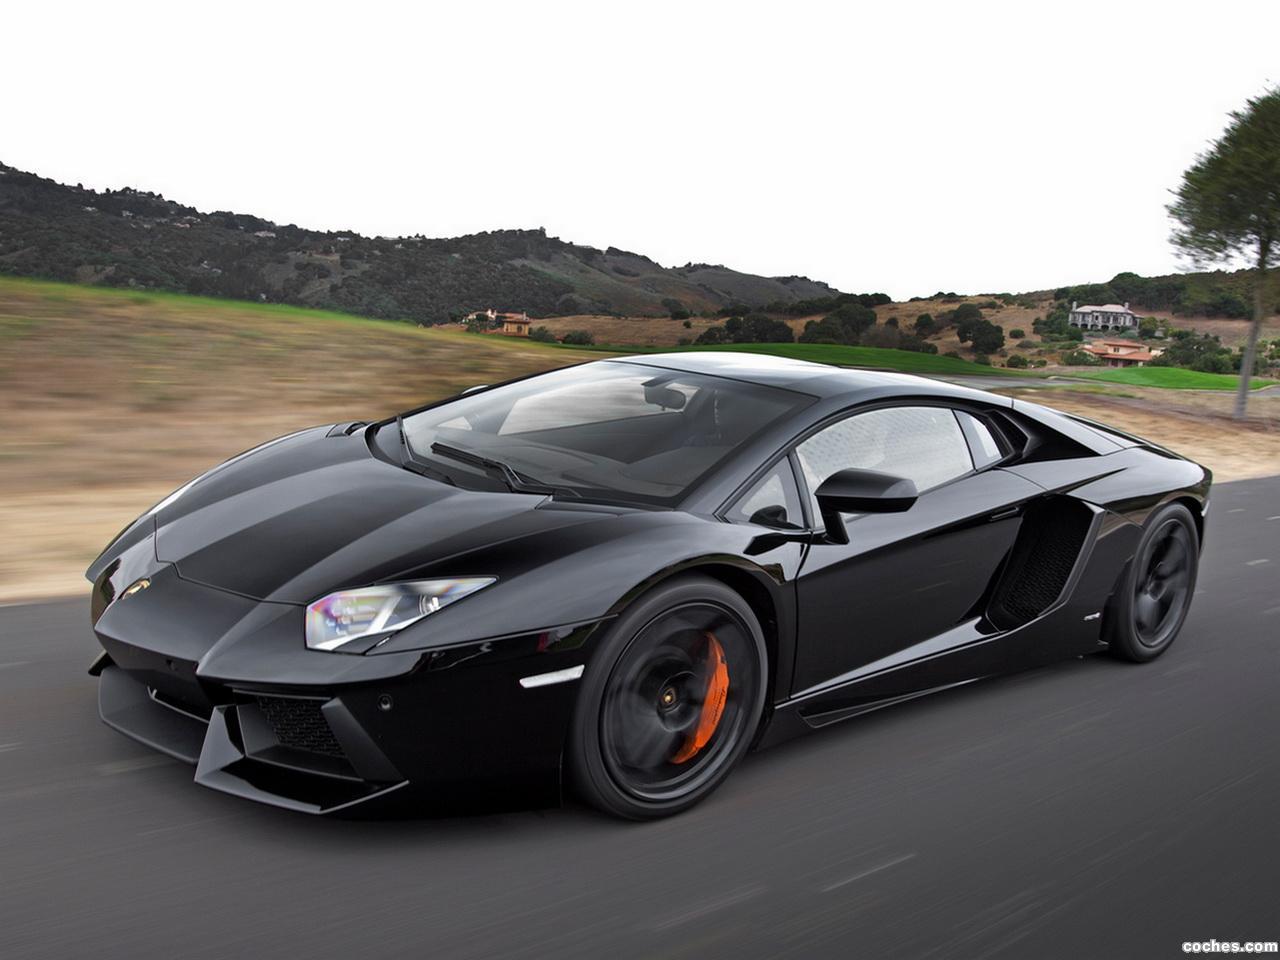 Foto 0 de Lamborghini Aventador LP700-4 USA 2011